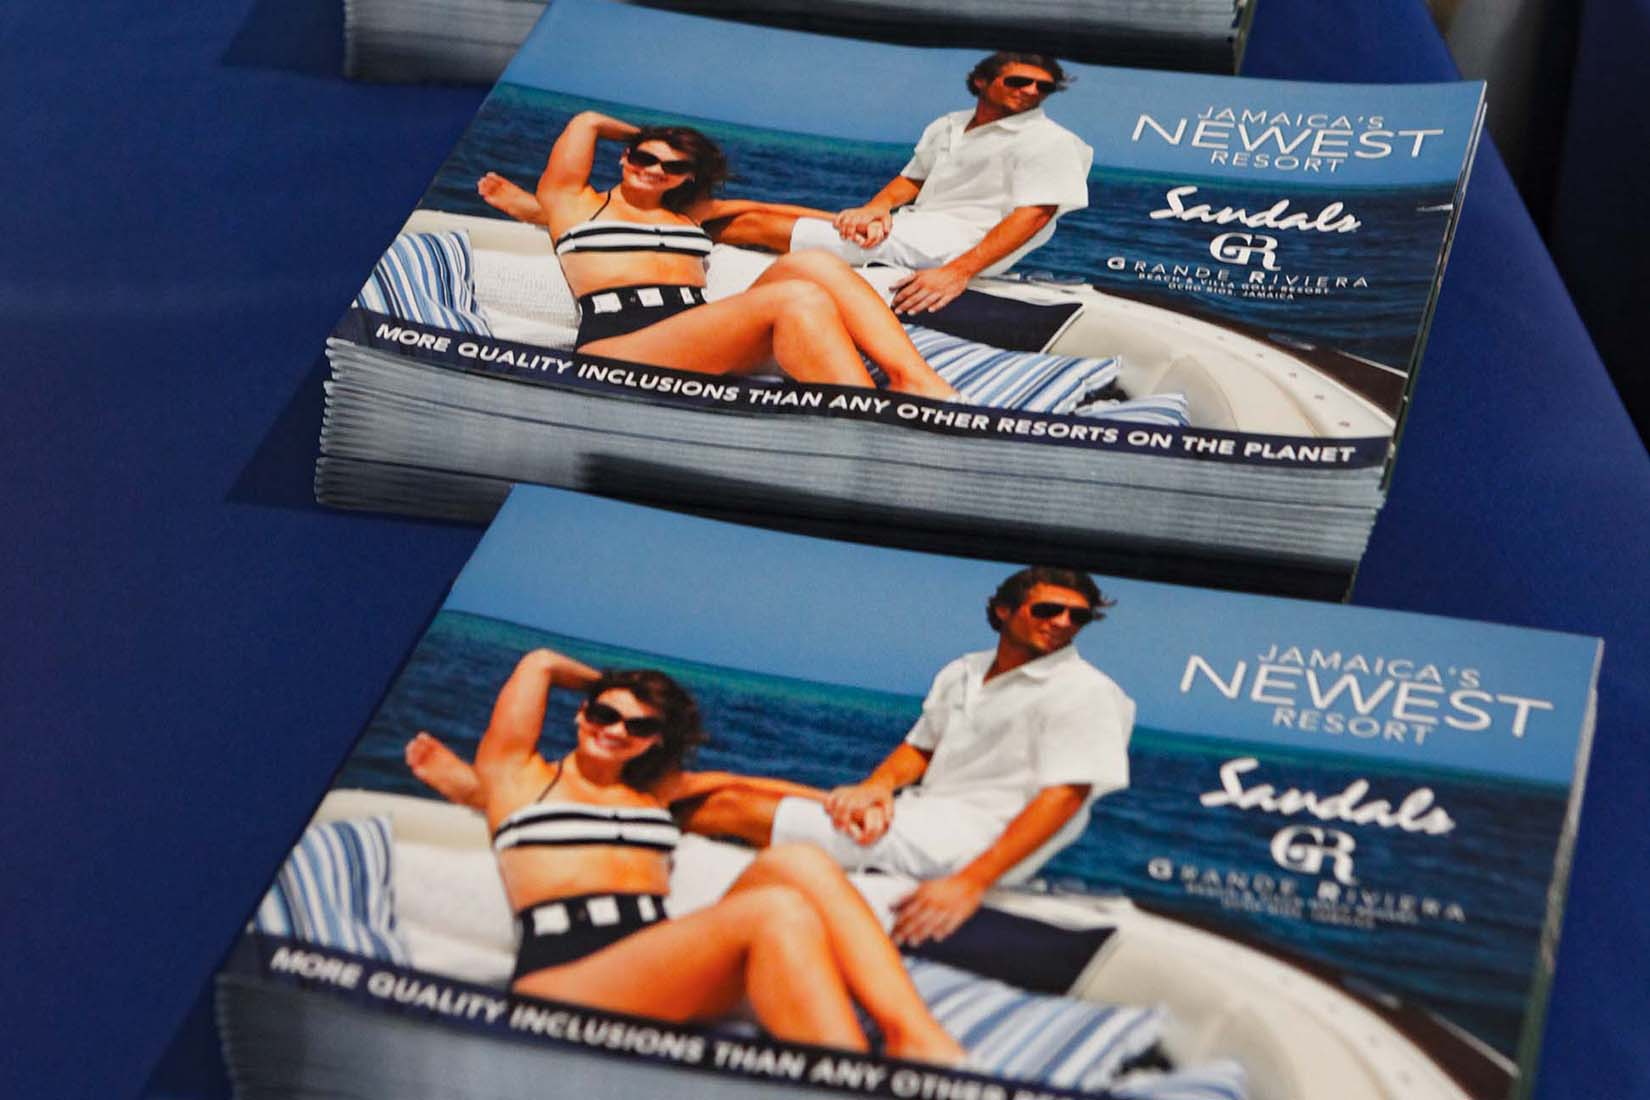 jamaica resort brochure photo